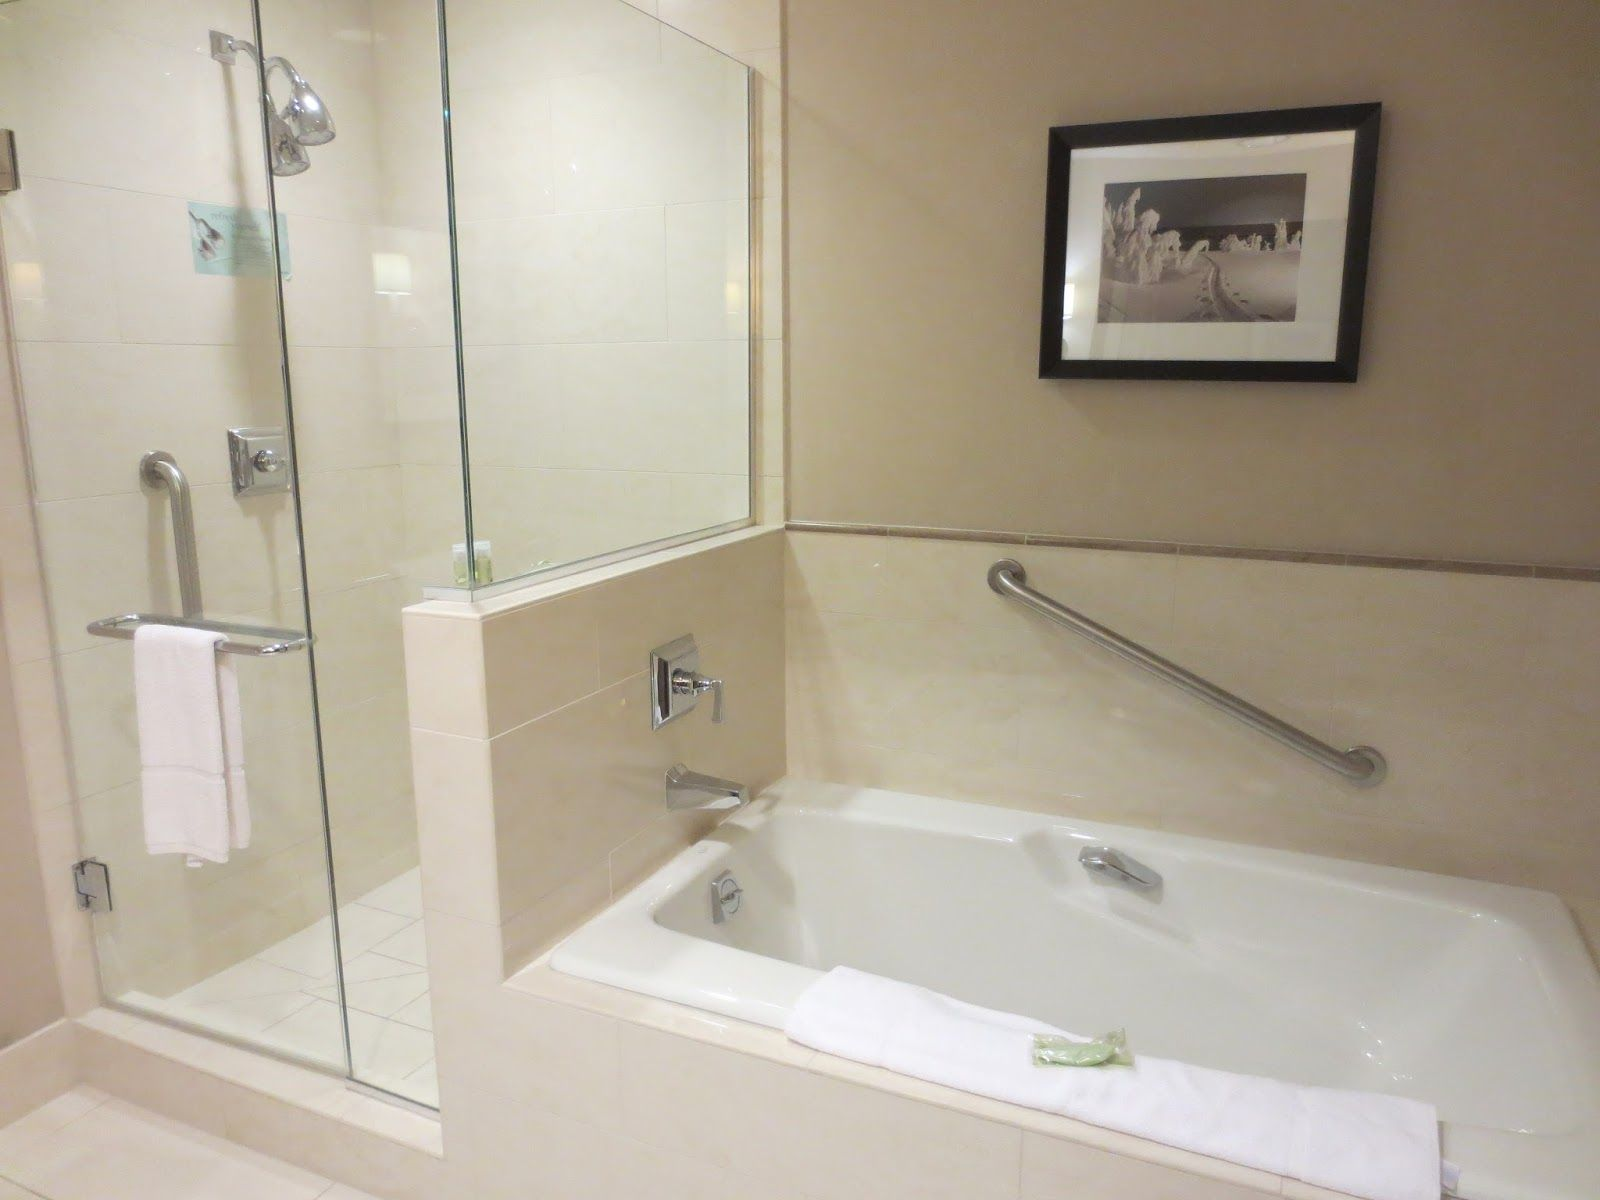 Cozy Kohler Shower Base For Your Bathroom Design Ideas ...